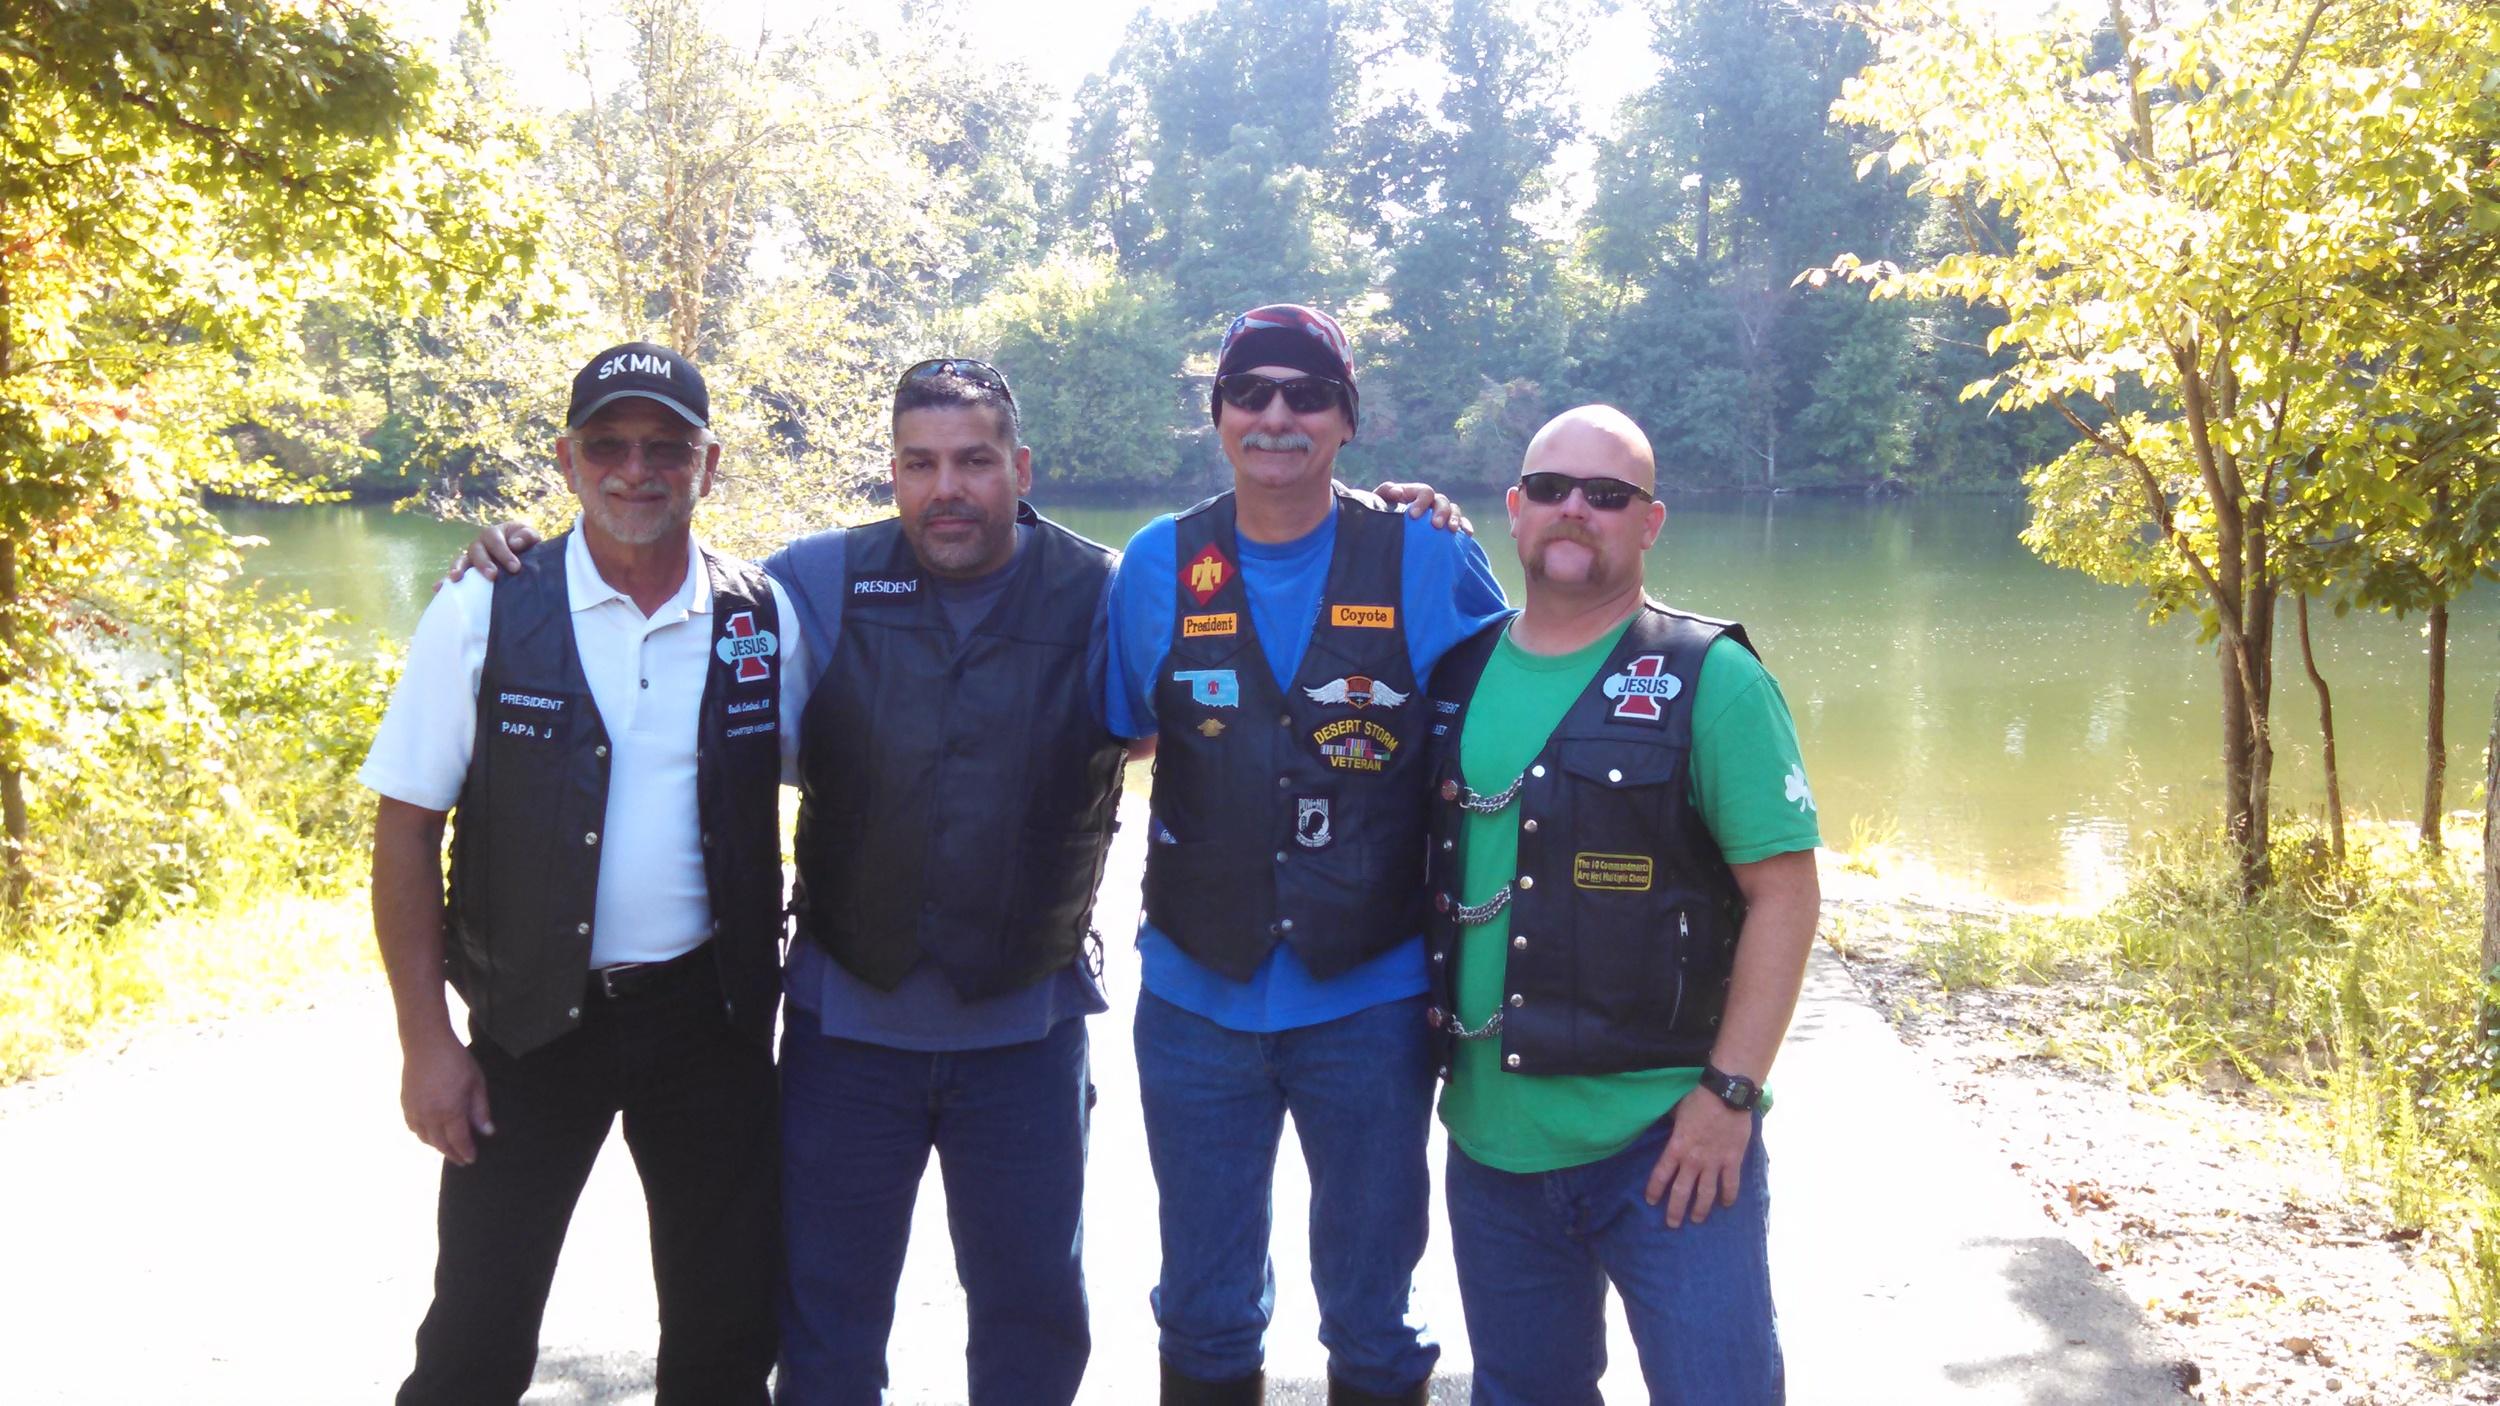 Chapter presidents from left to right: Jerry Watts (Wichita), Jamie Jimenez (Topeka), Donald Clark-(Oklahoma), Stuart Wolzen (Ottawa). Click on picture to enlarge.